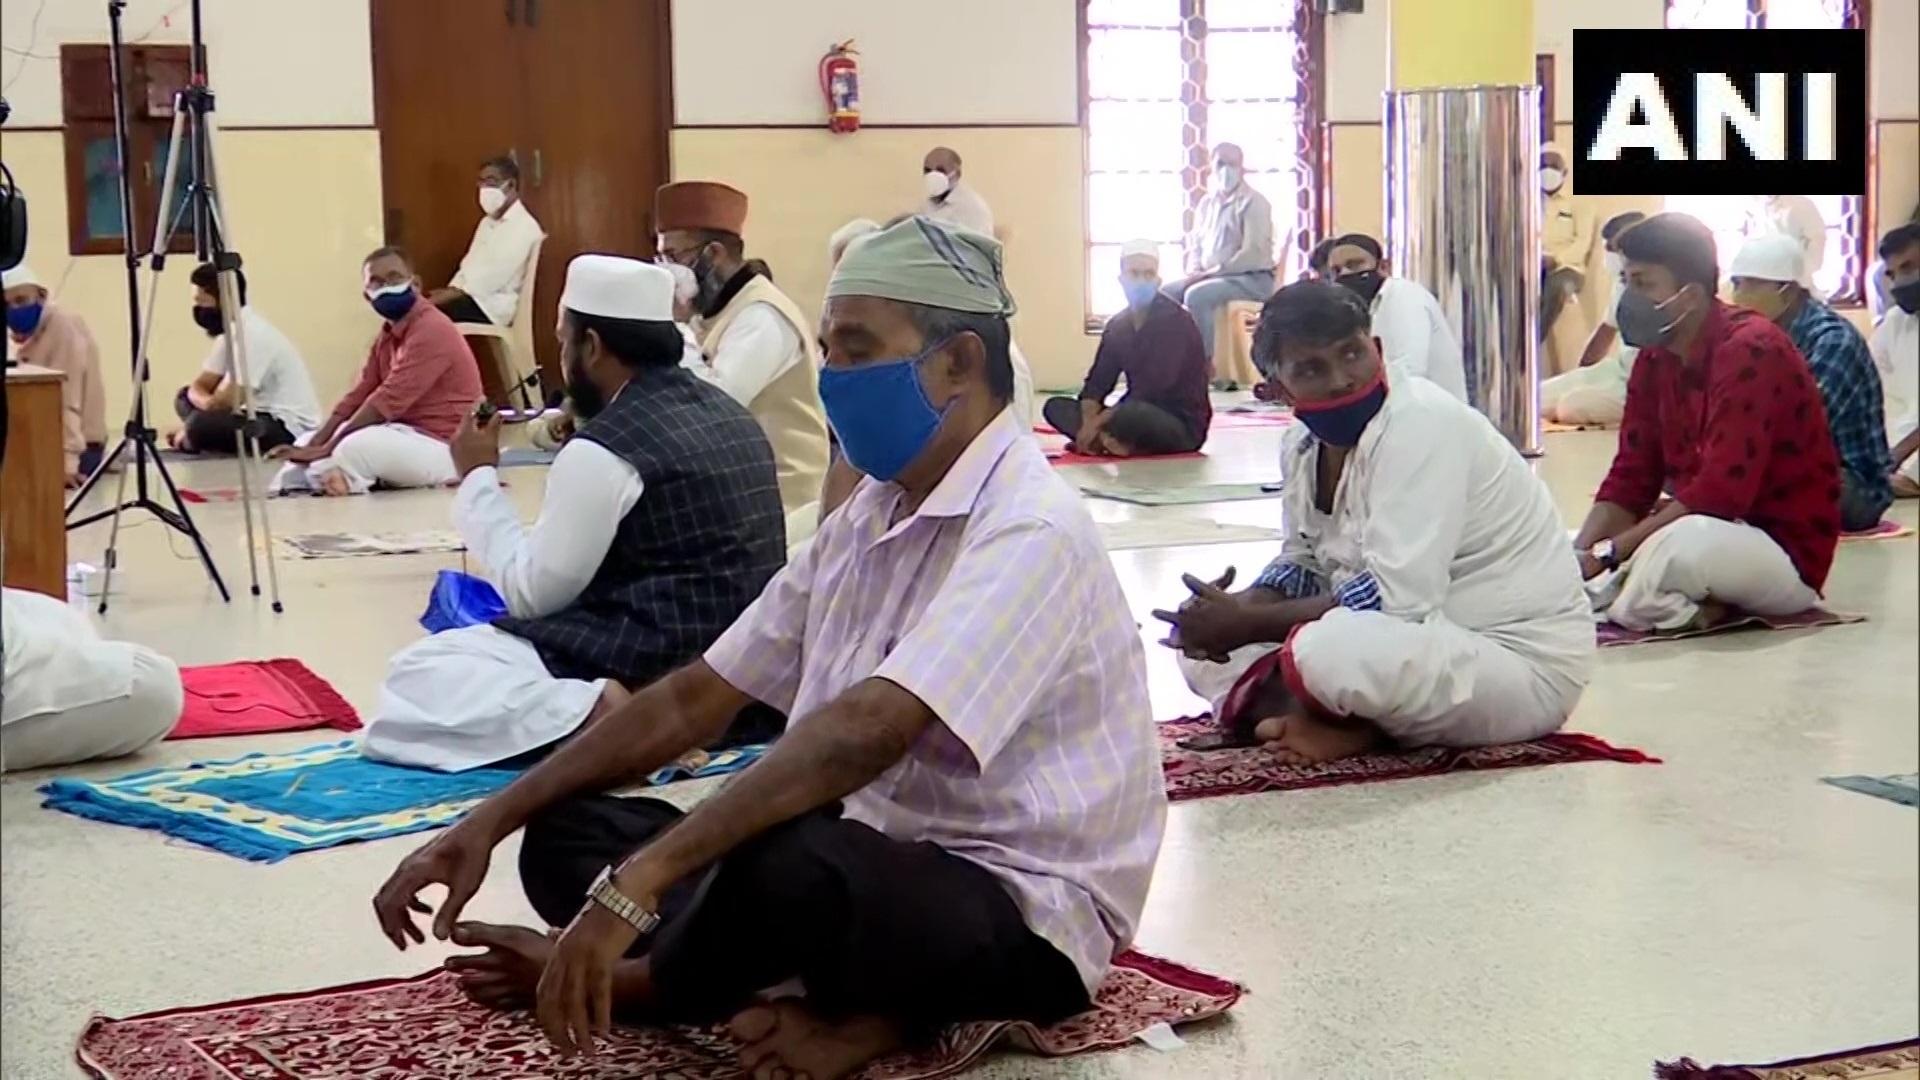 Photos: ಕೊರೊನಾವೈರಸ್ ಶಿಷ್ಟಾಚಾರಗಳ ಅಡಿ ಬಕ್ರೀದ್ ಹಬ್ಬ ಆಚರಣೆ